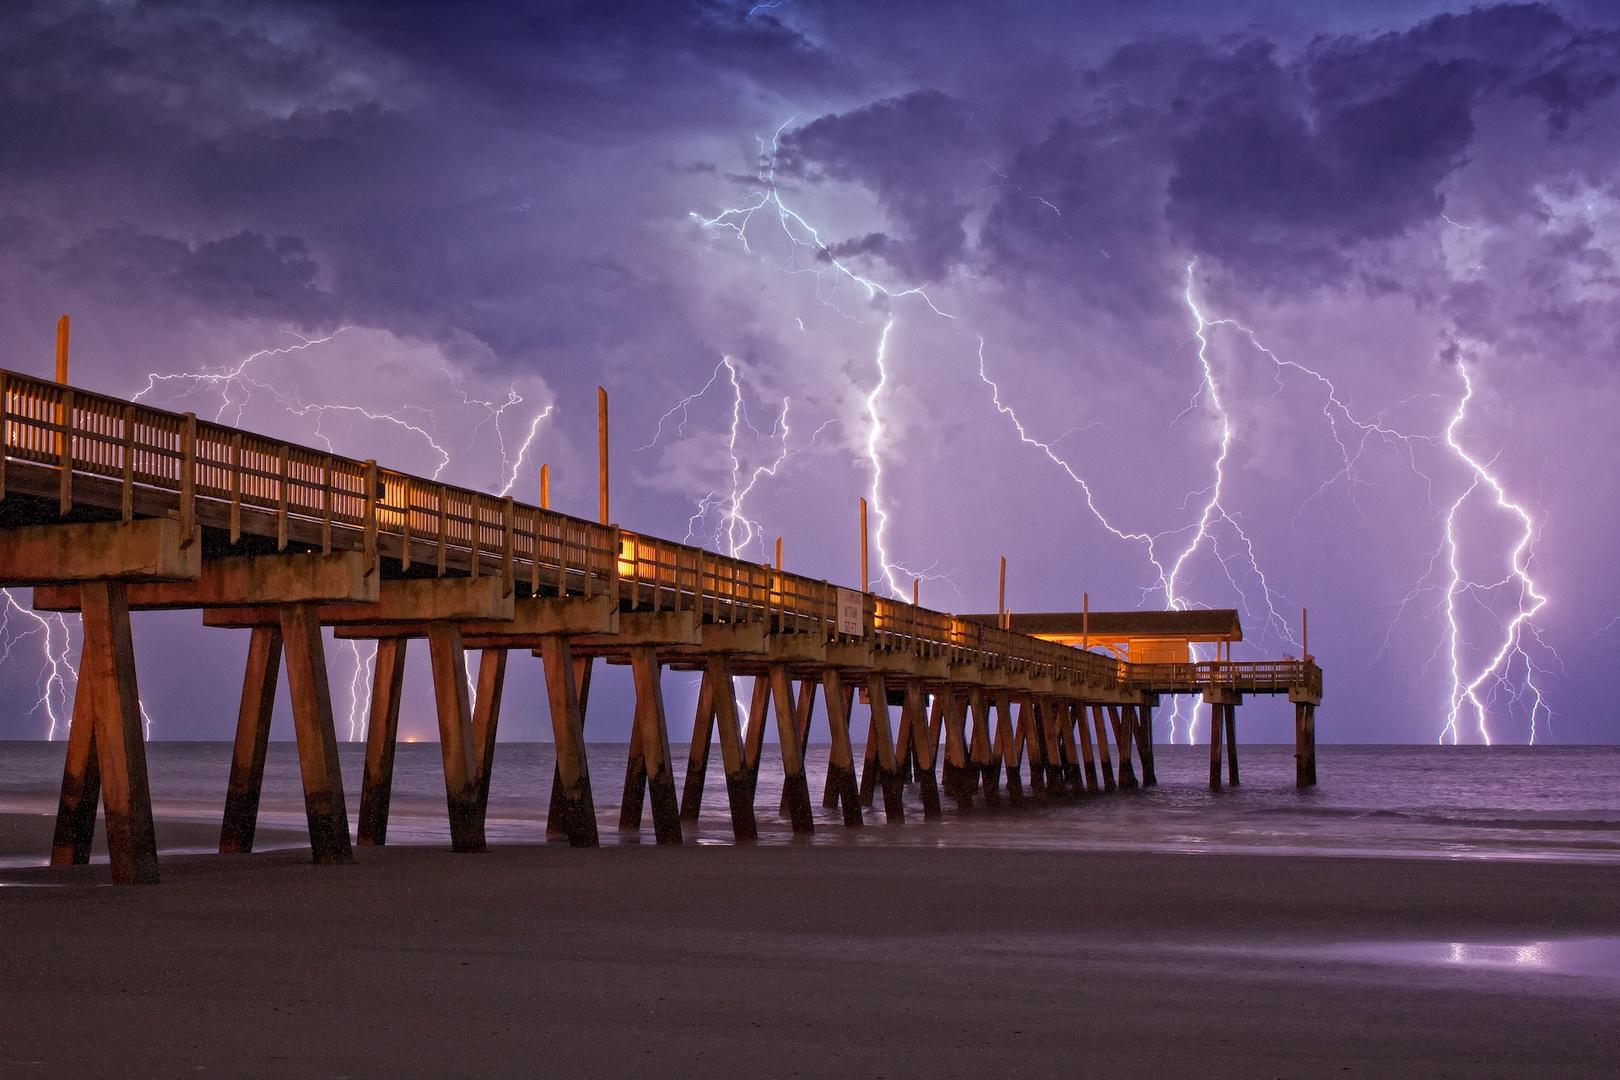 Tybee Island Pier Lightning Storm